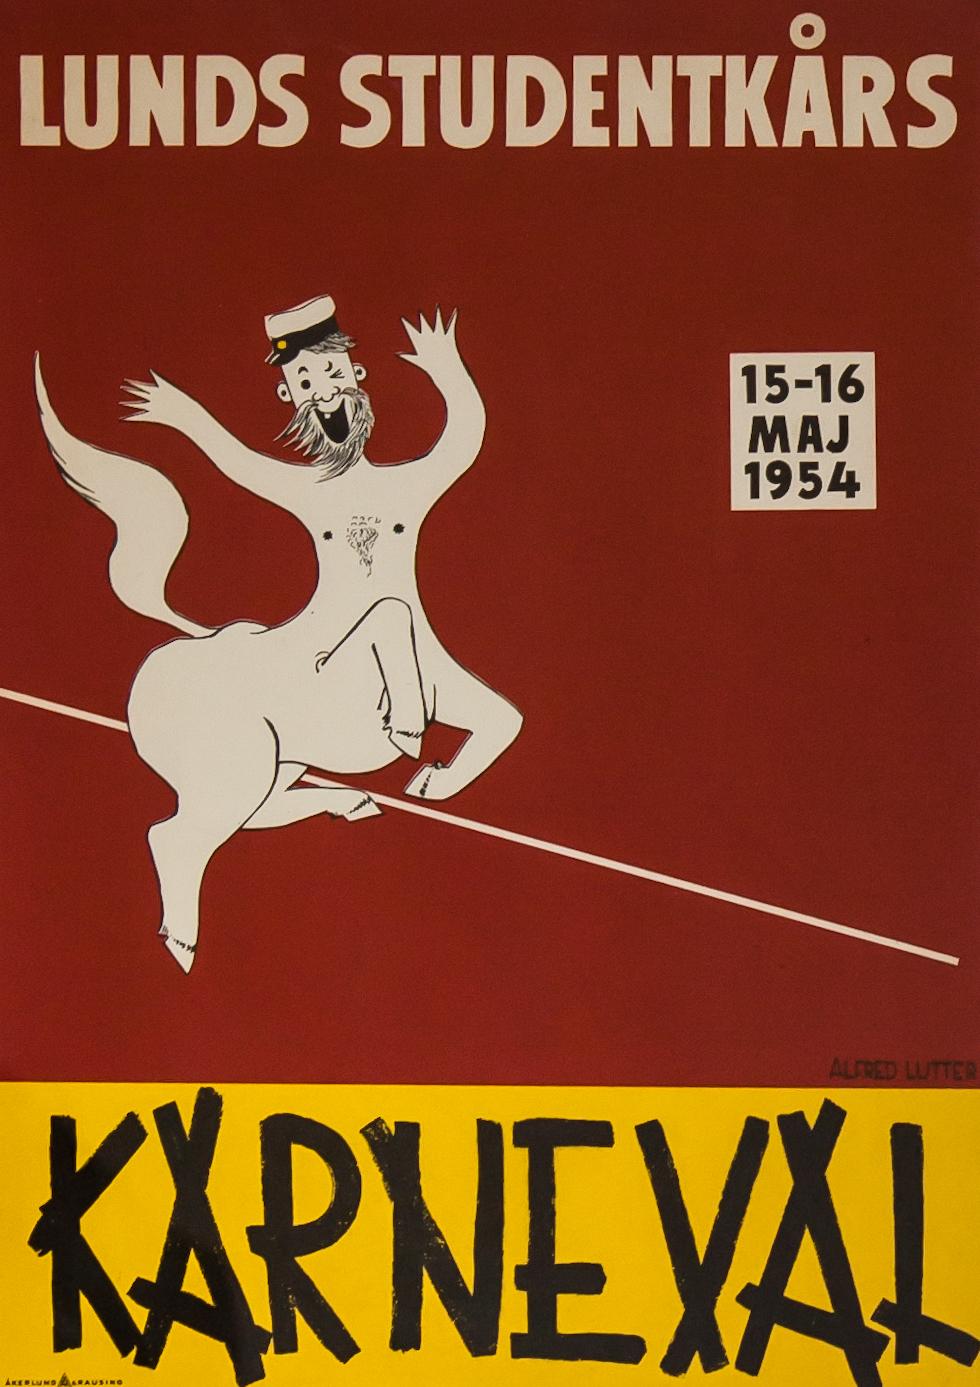 Lunds Studentkårs Karneval 1954